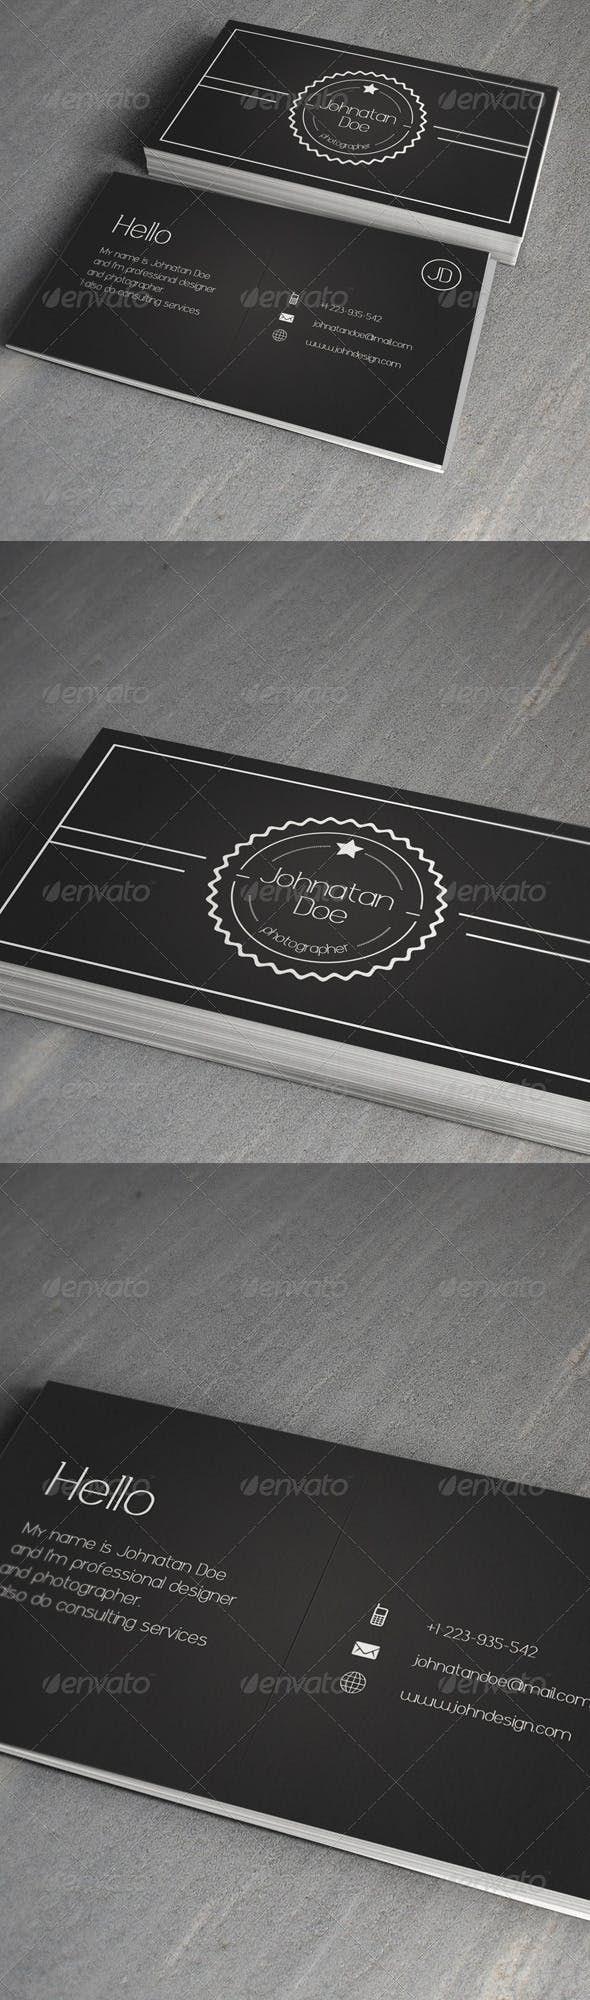 Business Card | Business card photoshop, Business cards ...